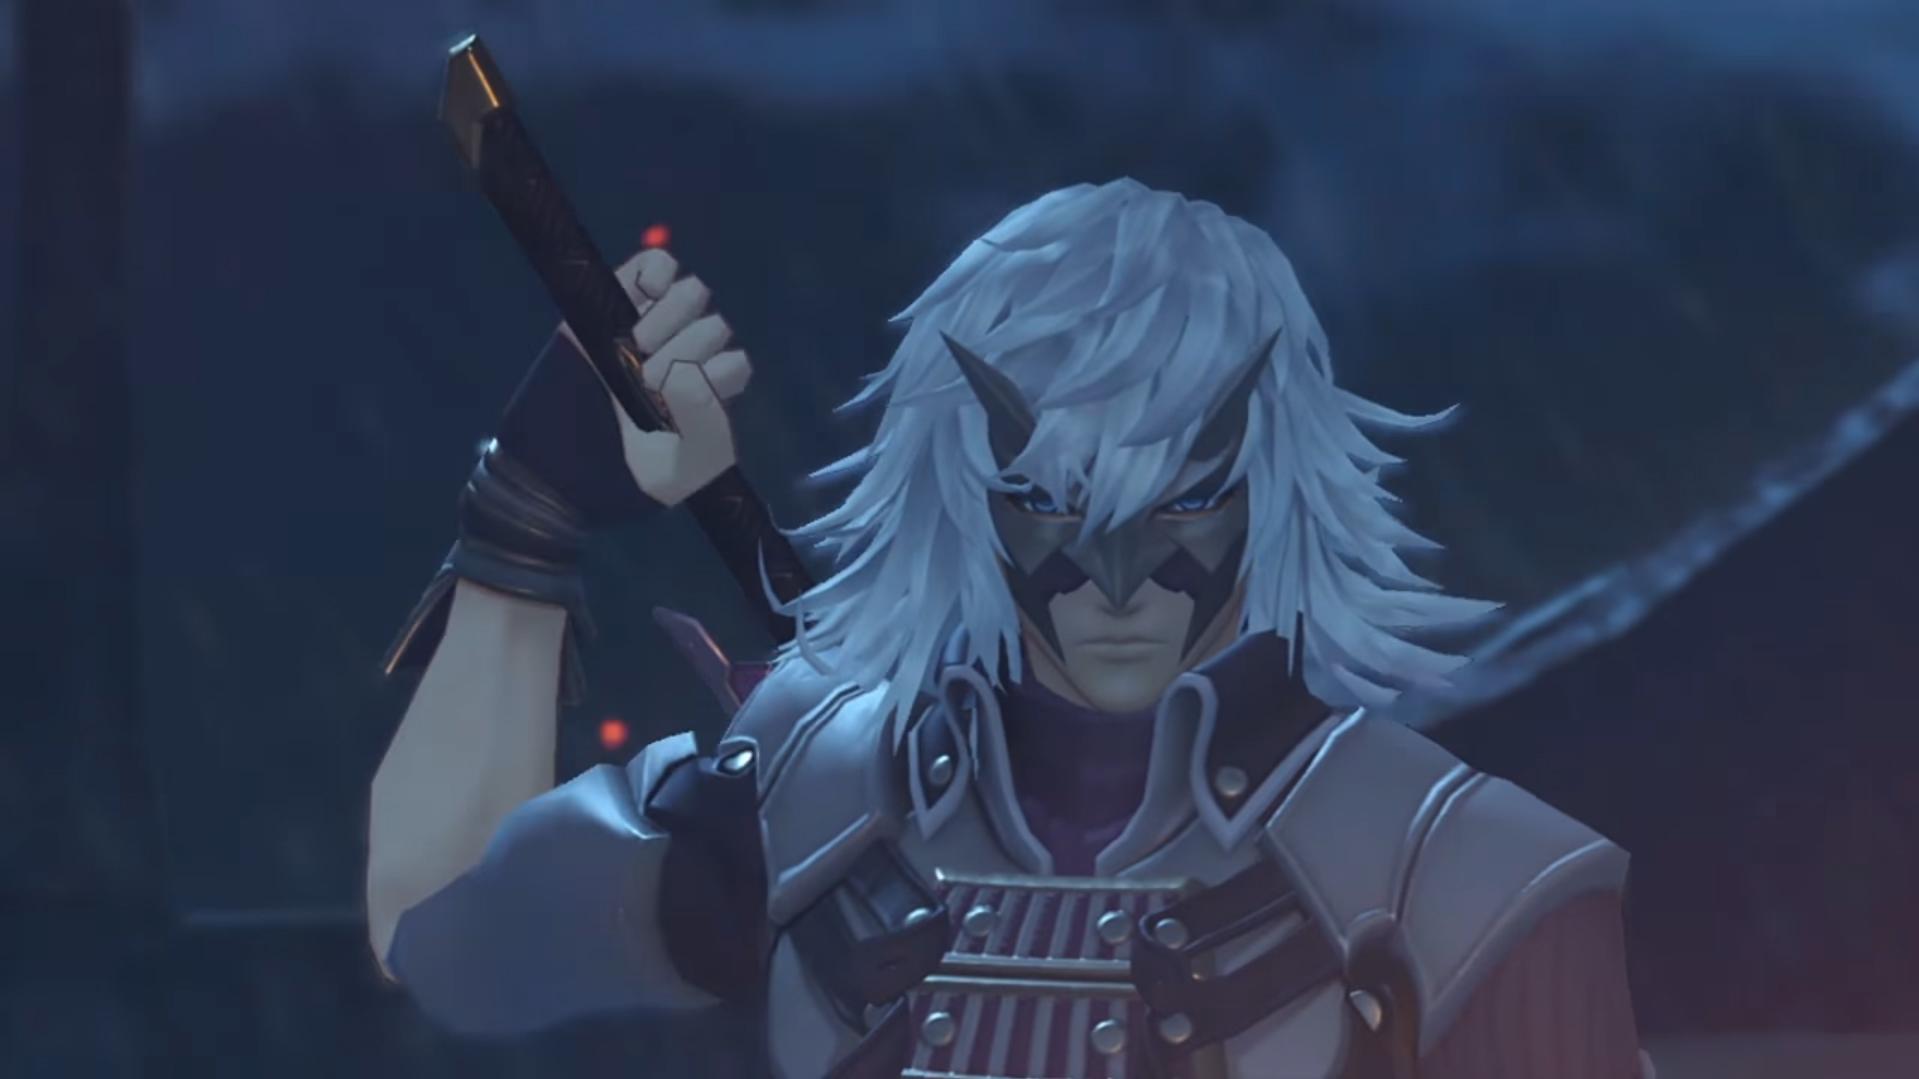 Tetsuya Nomura is a character designer for Xenoblade Chronicles 2 screenshot